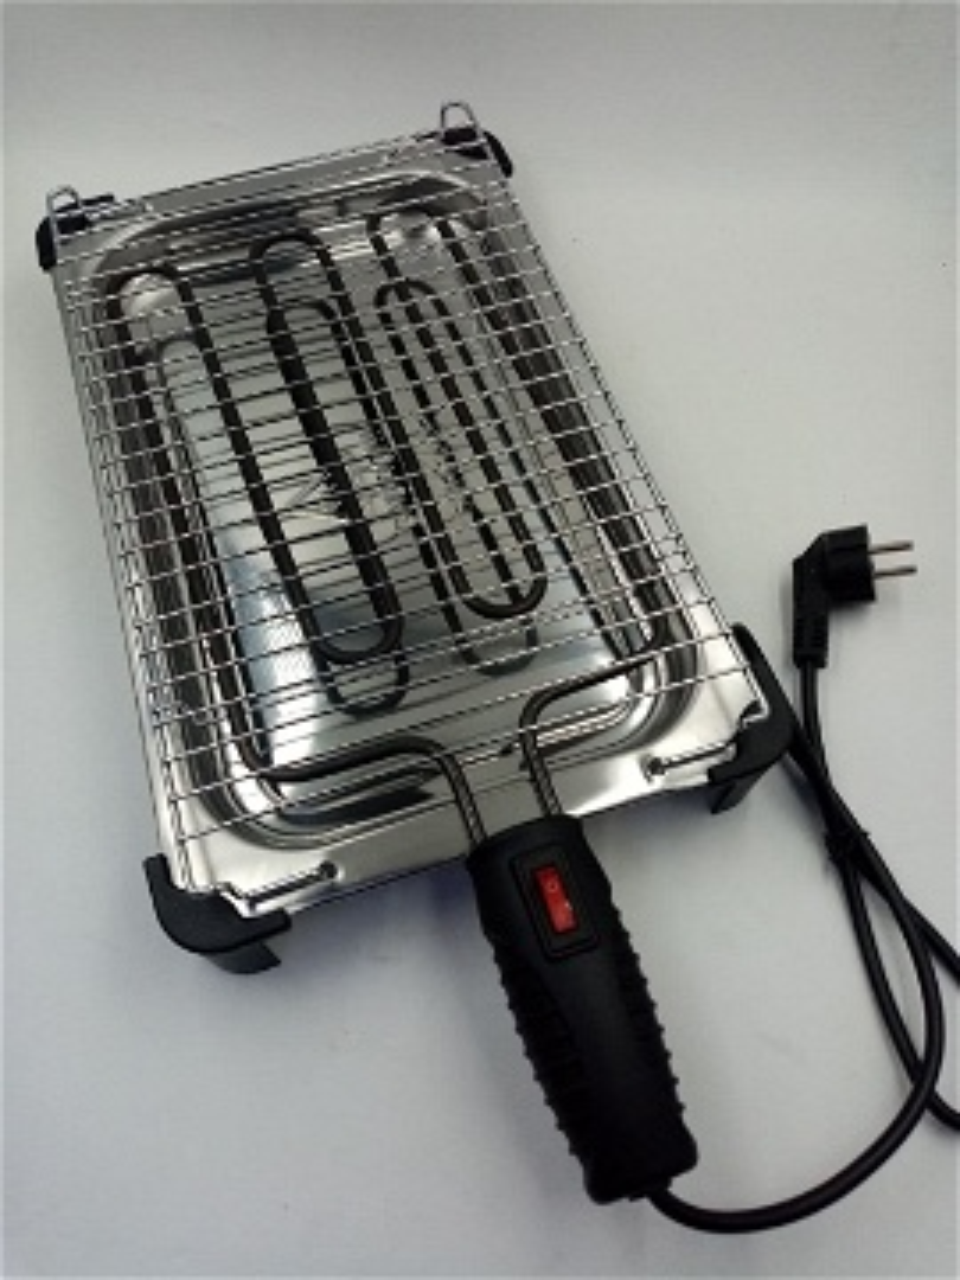 Itimat شواية كهرباءية من النوع الجيد